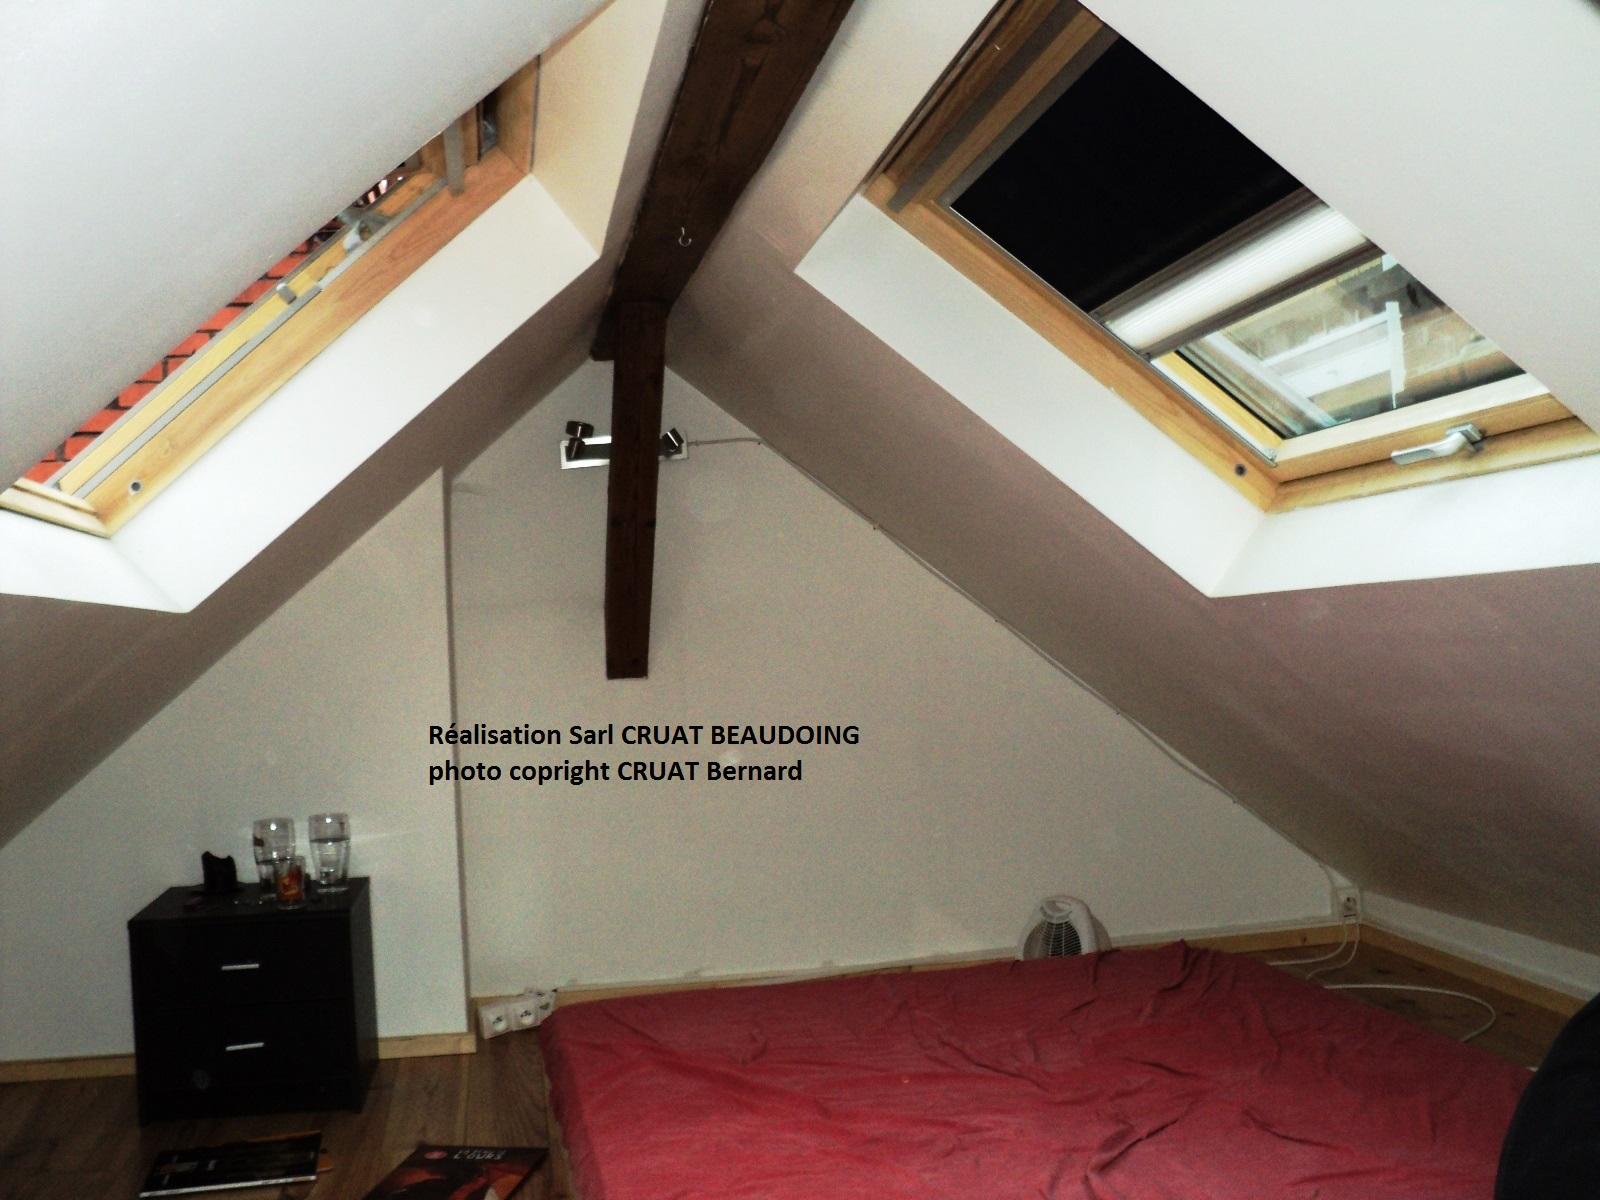 pose de noue de toiture grenoble pose velux sur. Black Bedroom Furniture Sets. Home Design Ideas